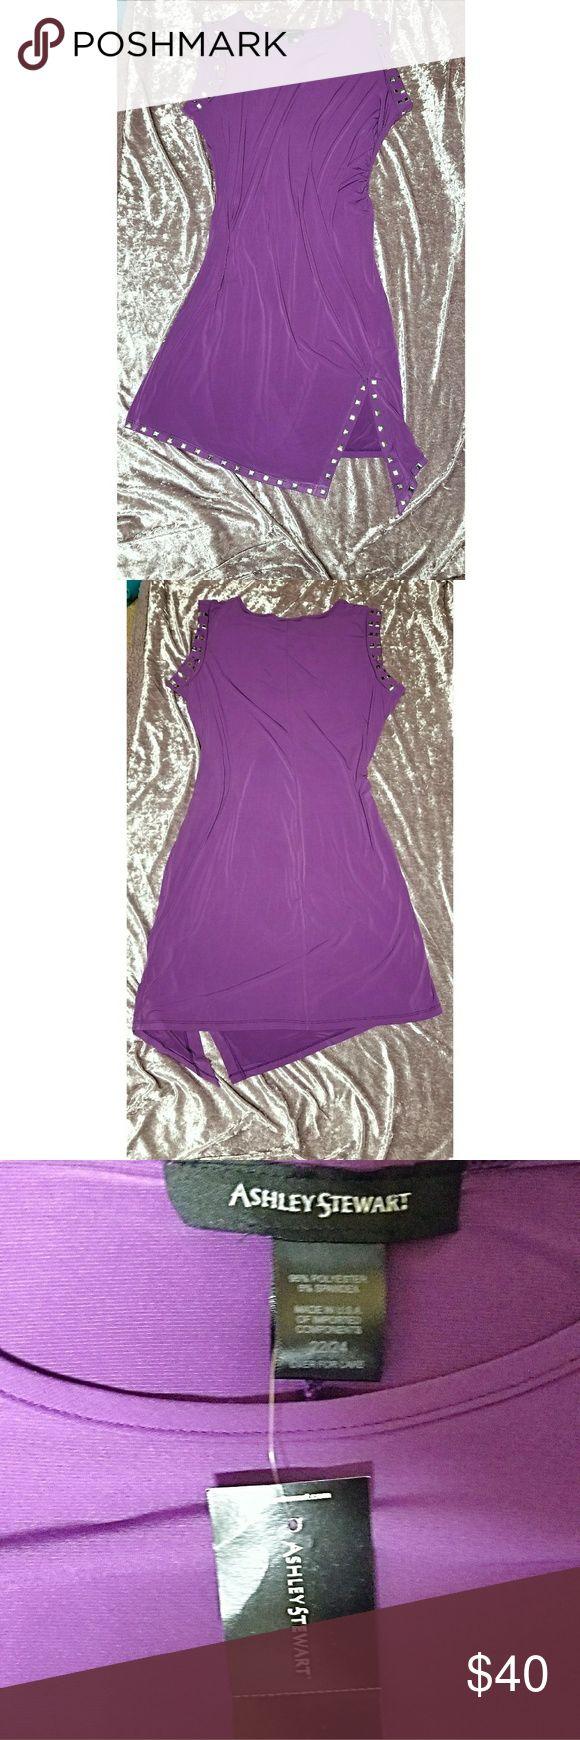 Buy on Poshmark!  Ashley Stewart dress NEW. #shopmycloset #poshmark #fashion #shopping #style #forsale #Ashley Stewart #Dresses & Skirts